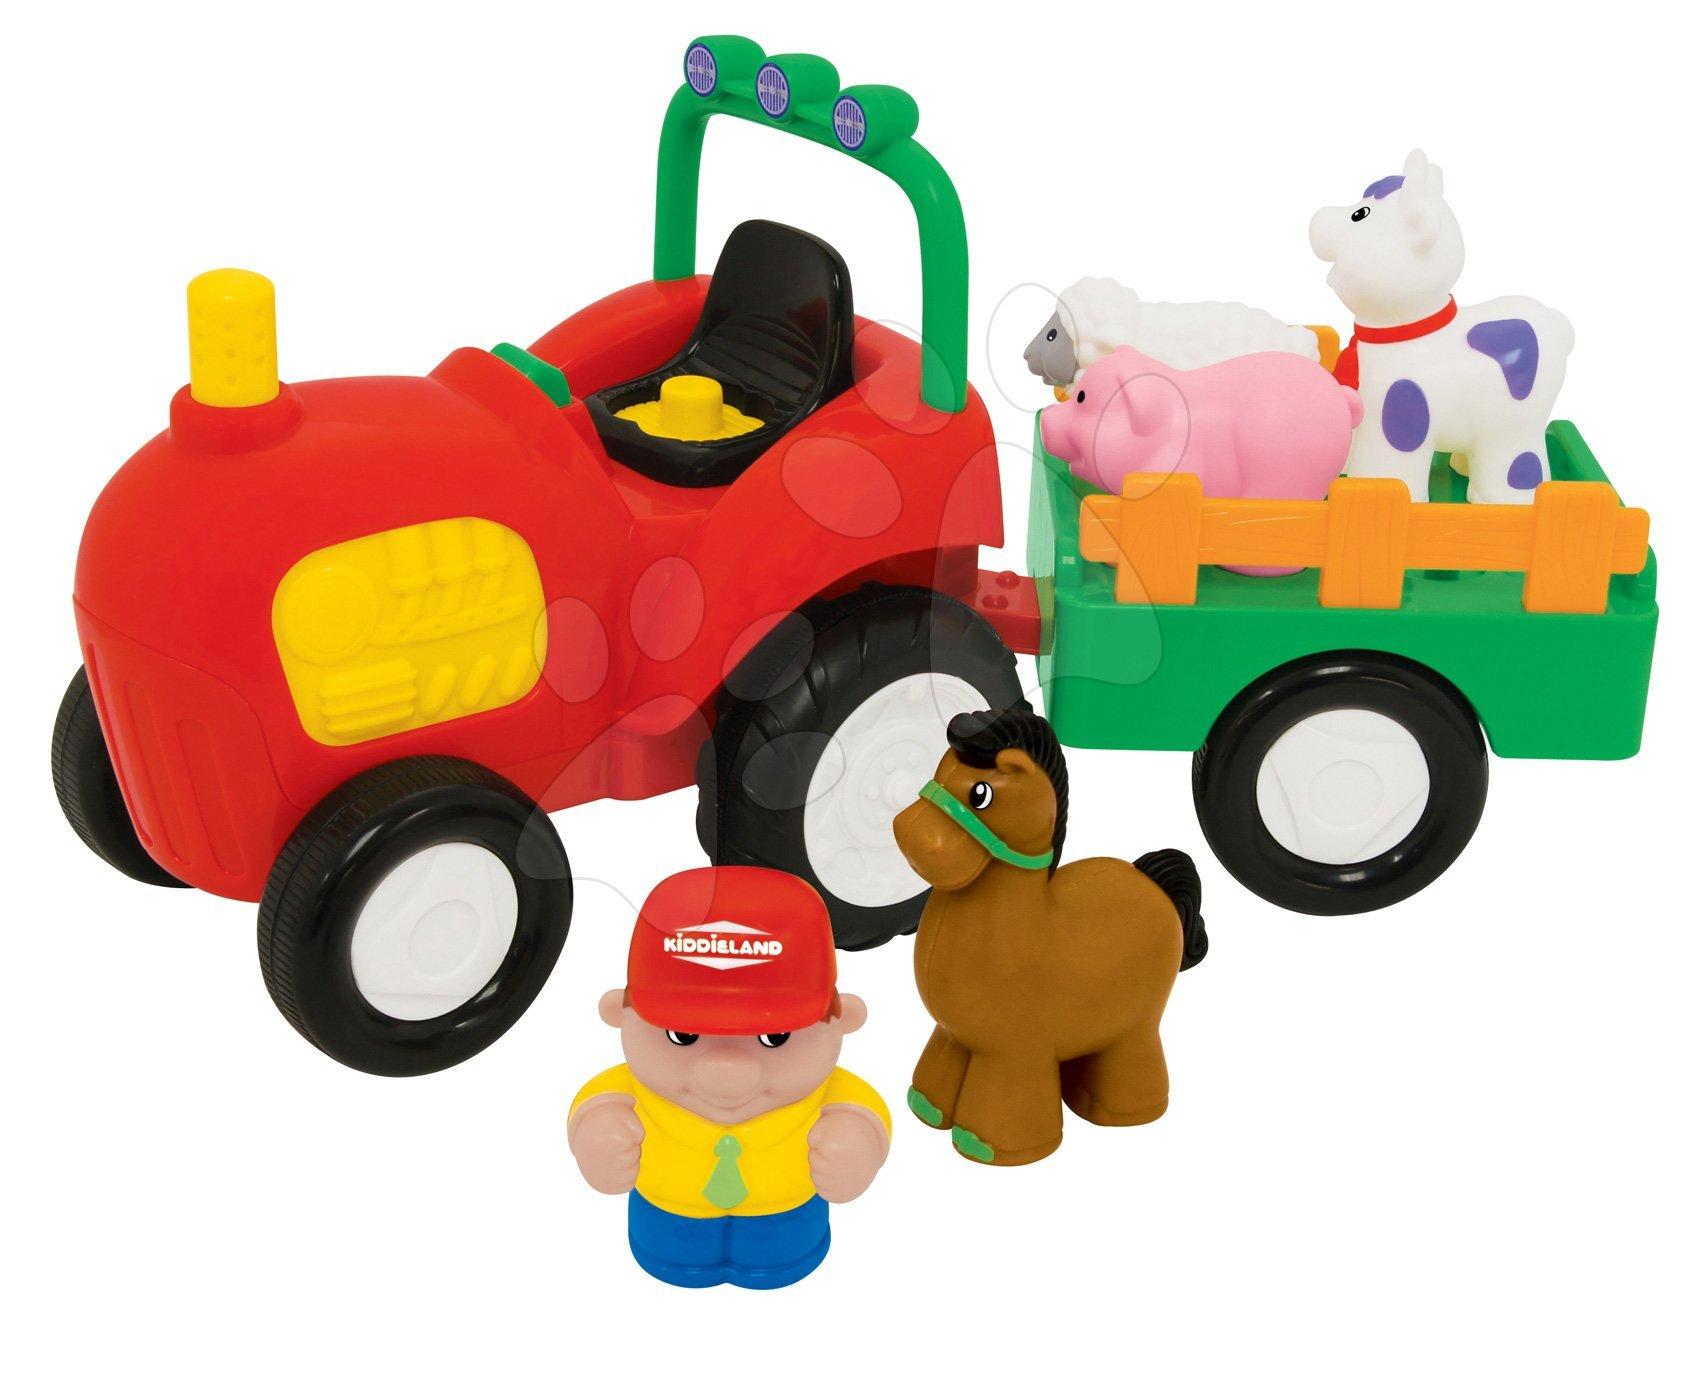 Traktor Activity Kiddieland z živalicami in zvokom od 12 mes